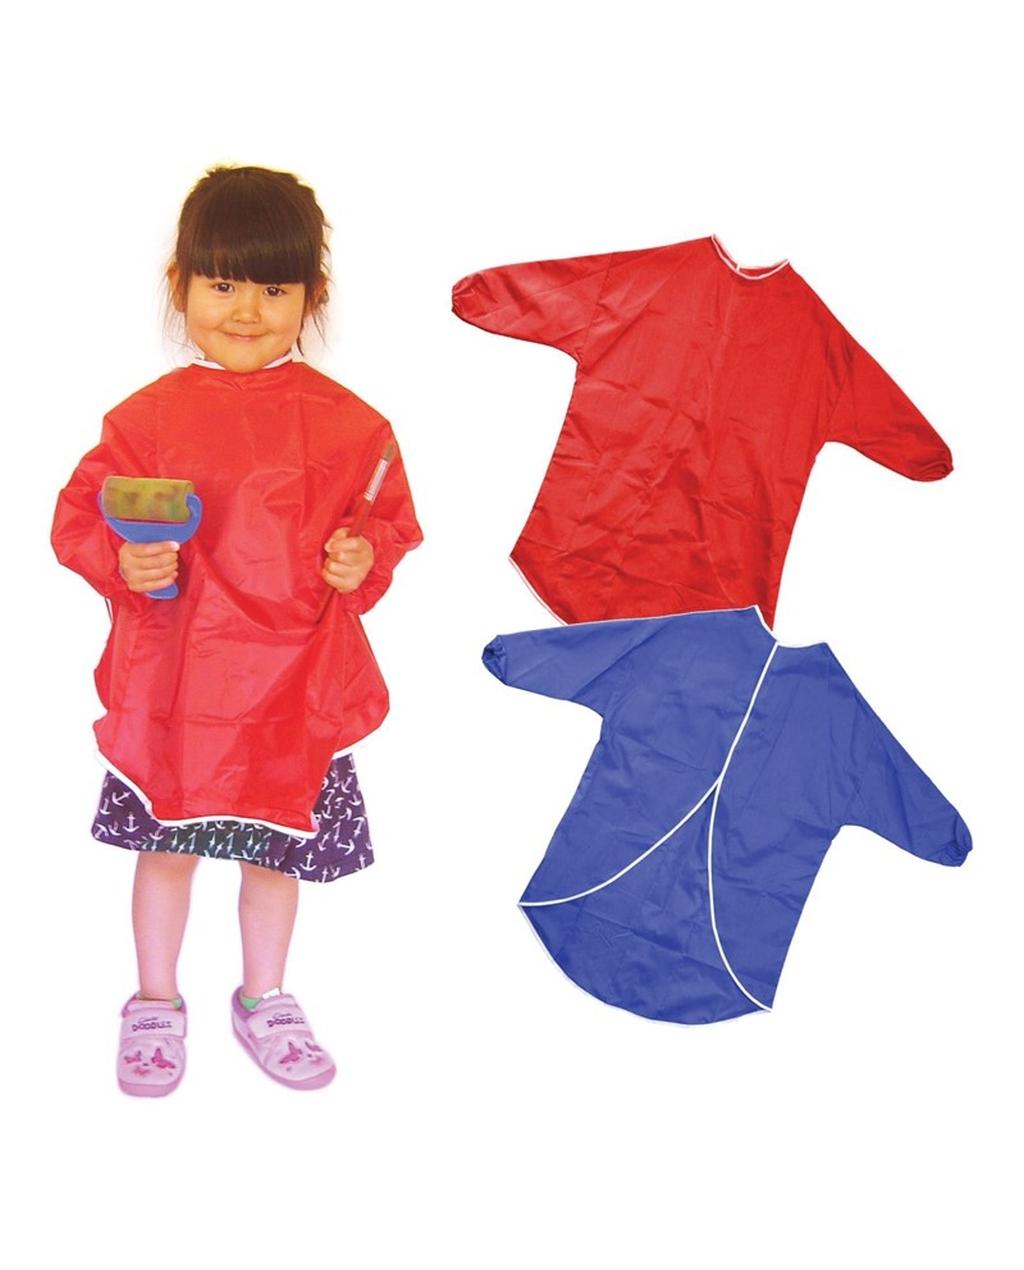 Children's Play Apron 75cm Red